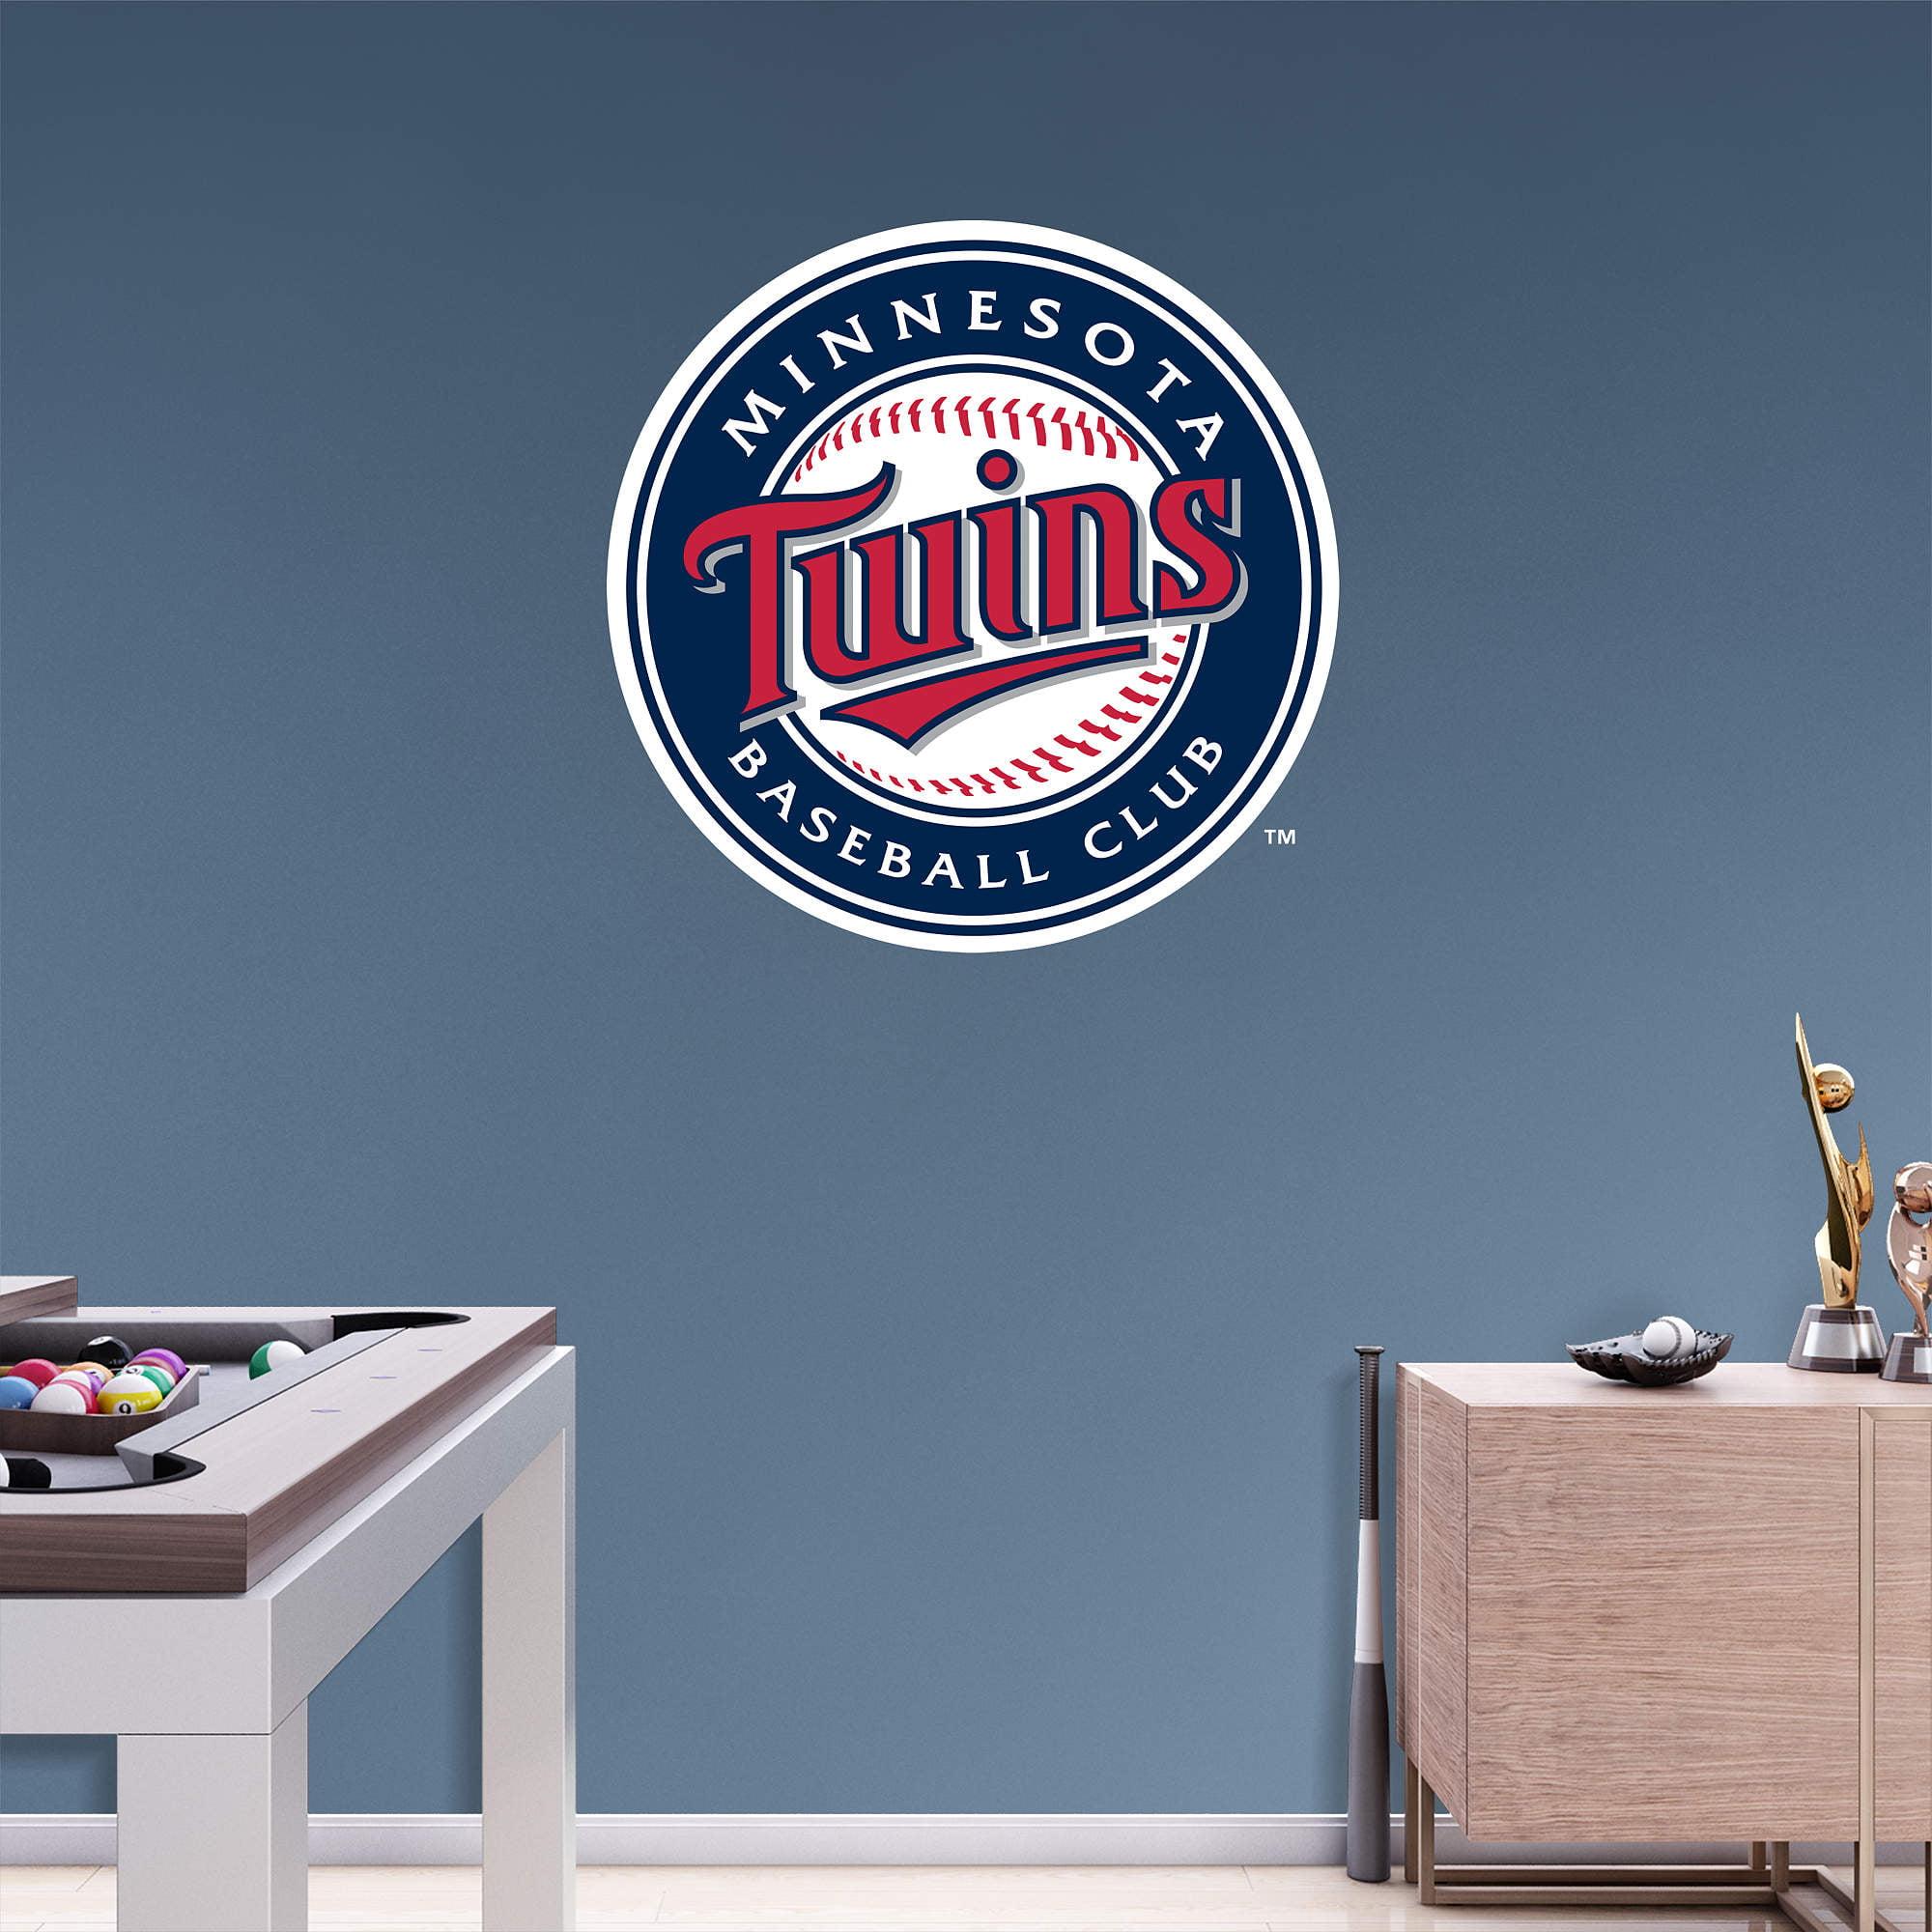 Minnesota Twins Fathead Team Logo Wall Decal - No Size